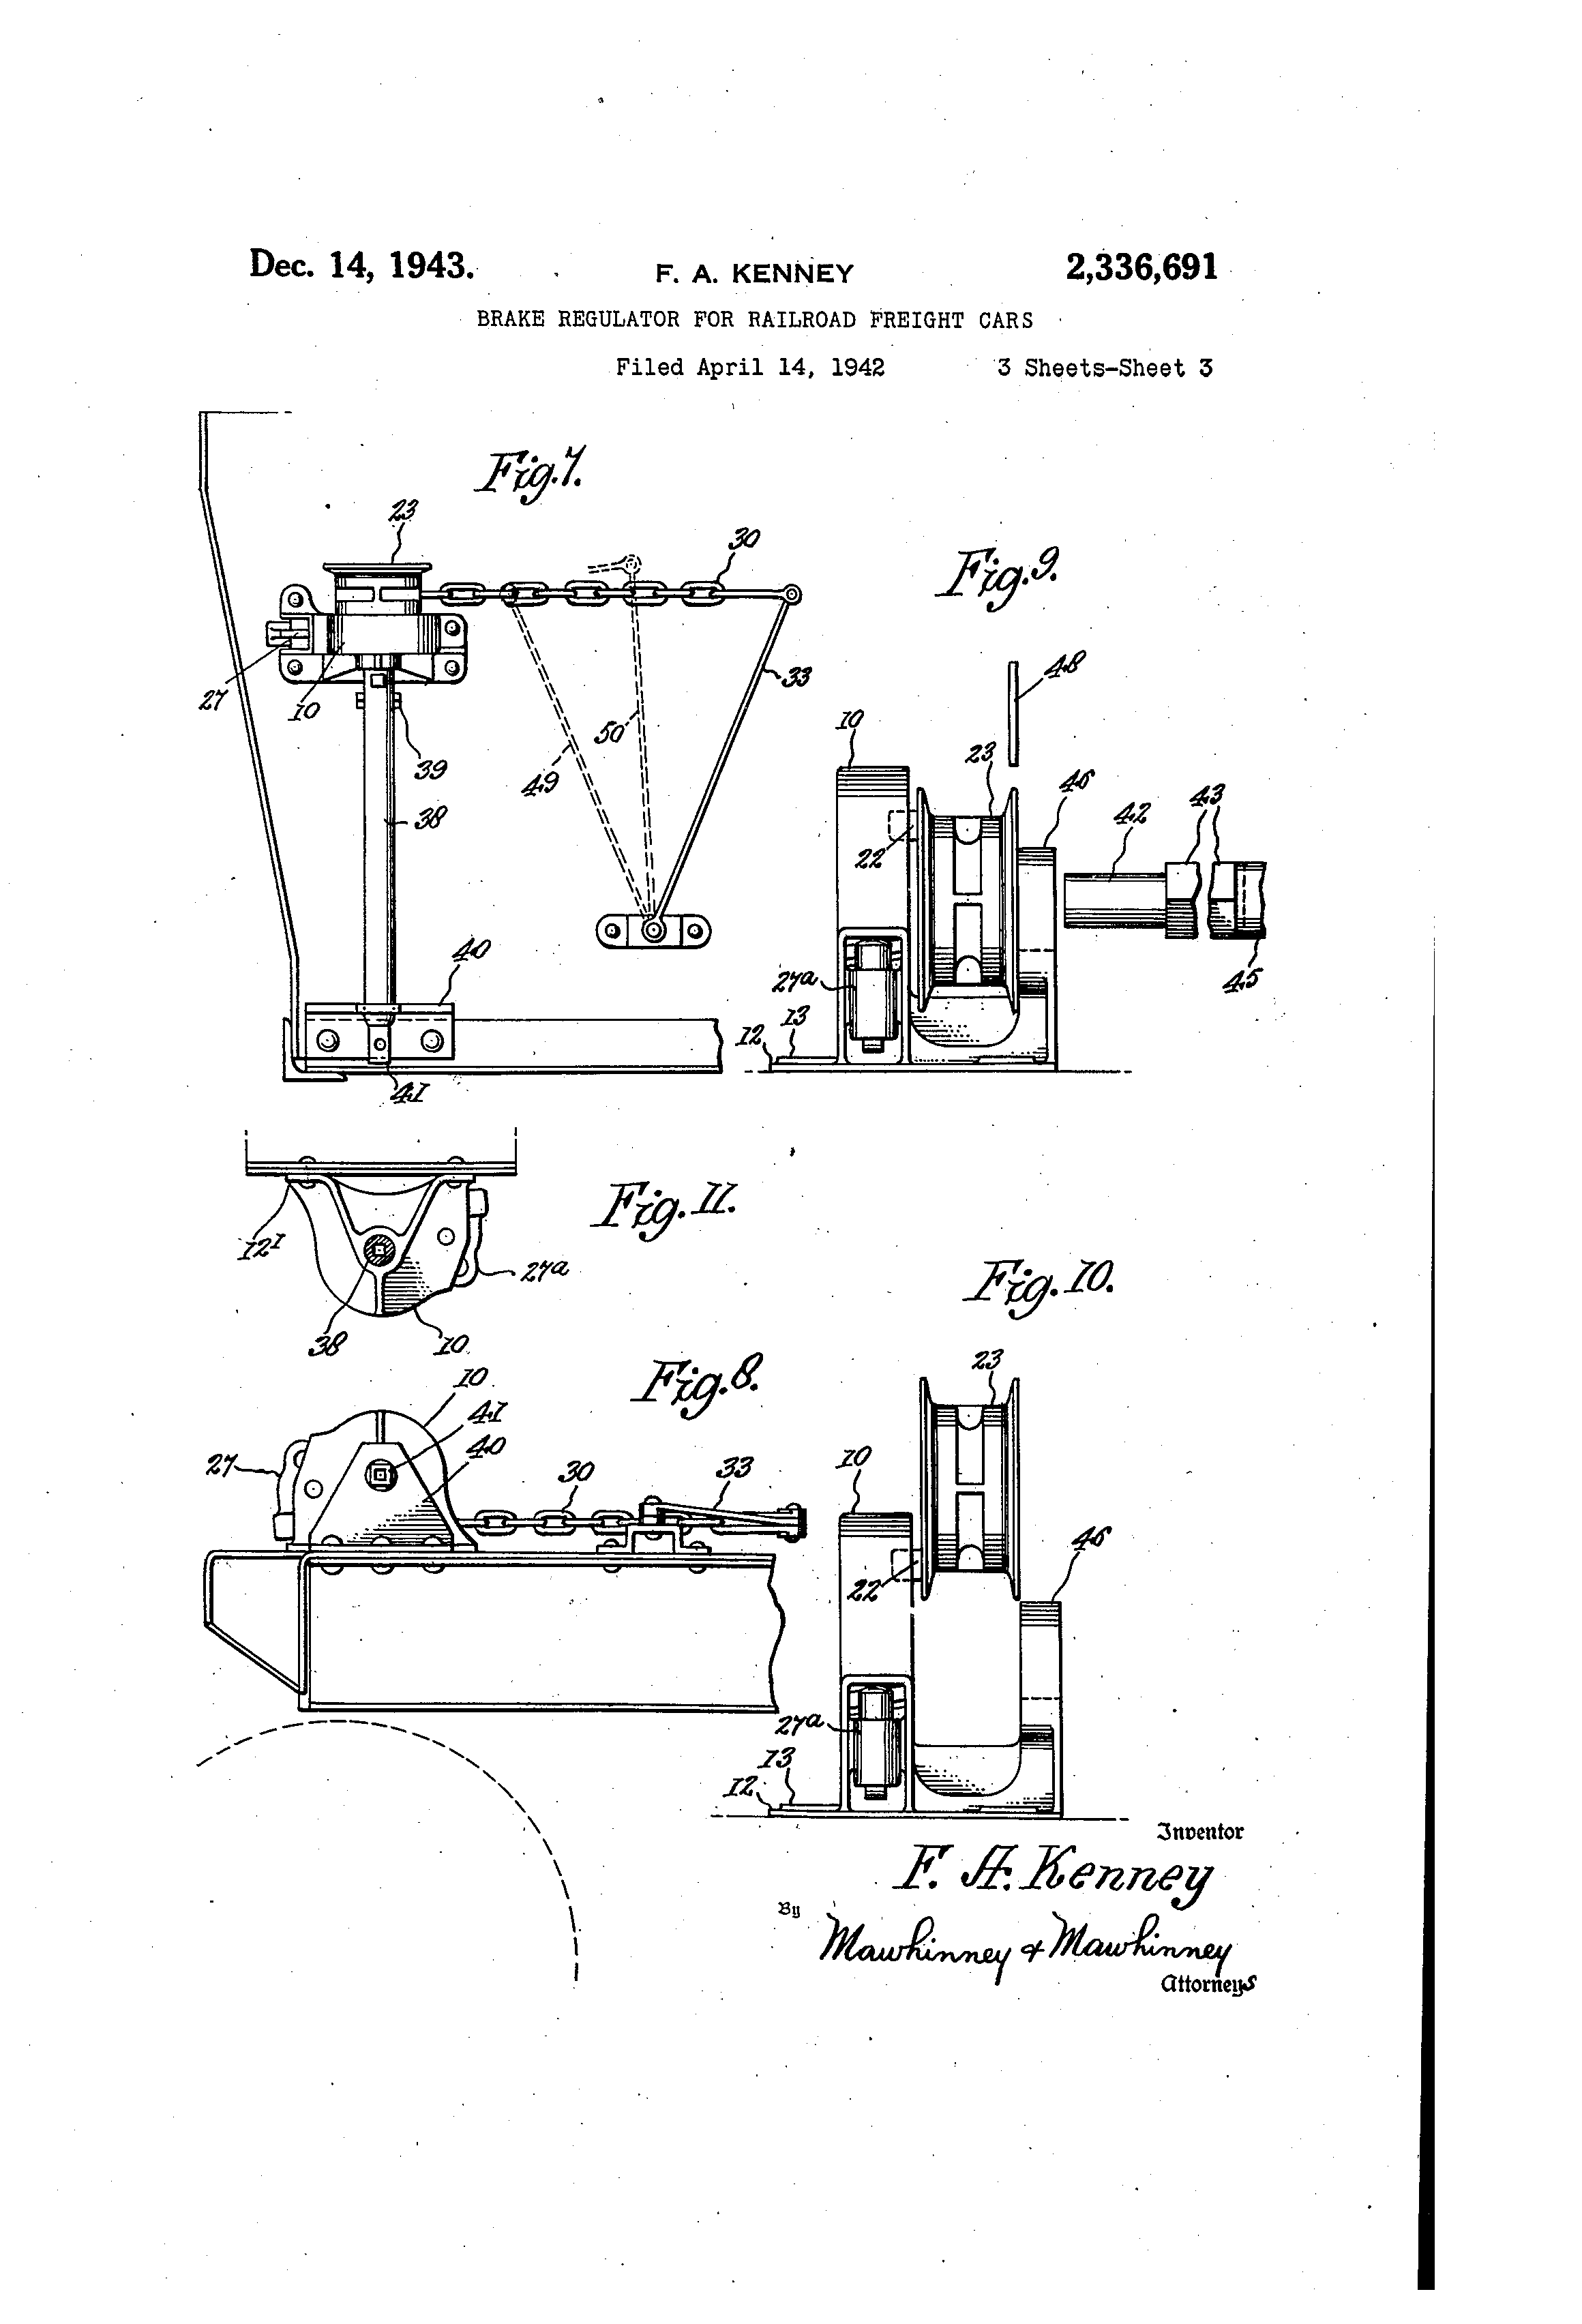 Railroad Freight Car Diagrams